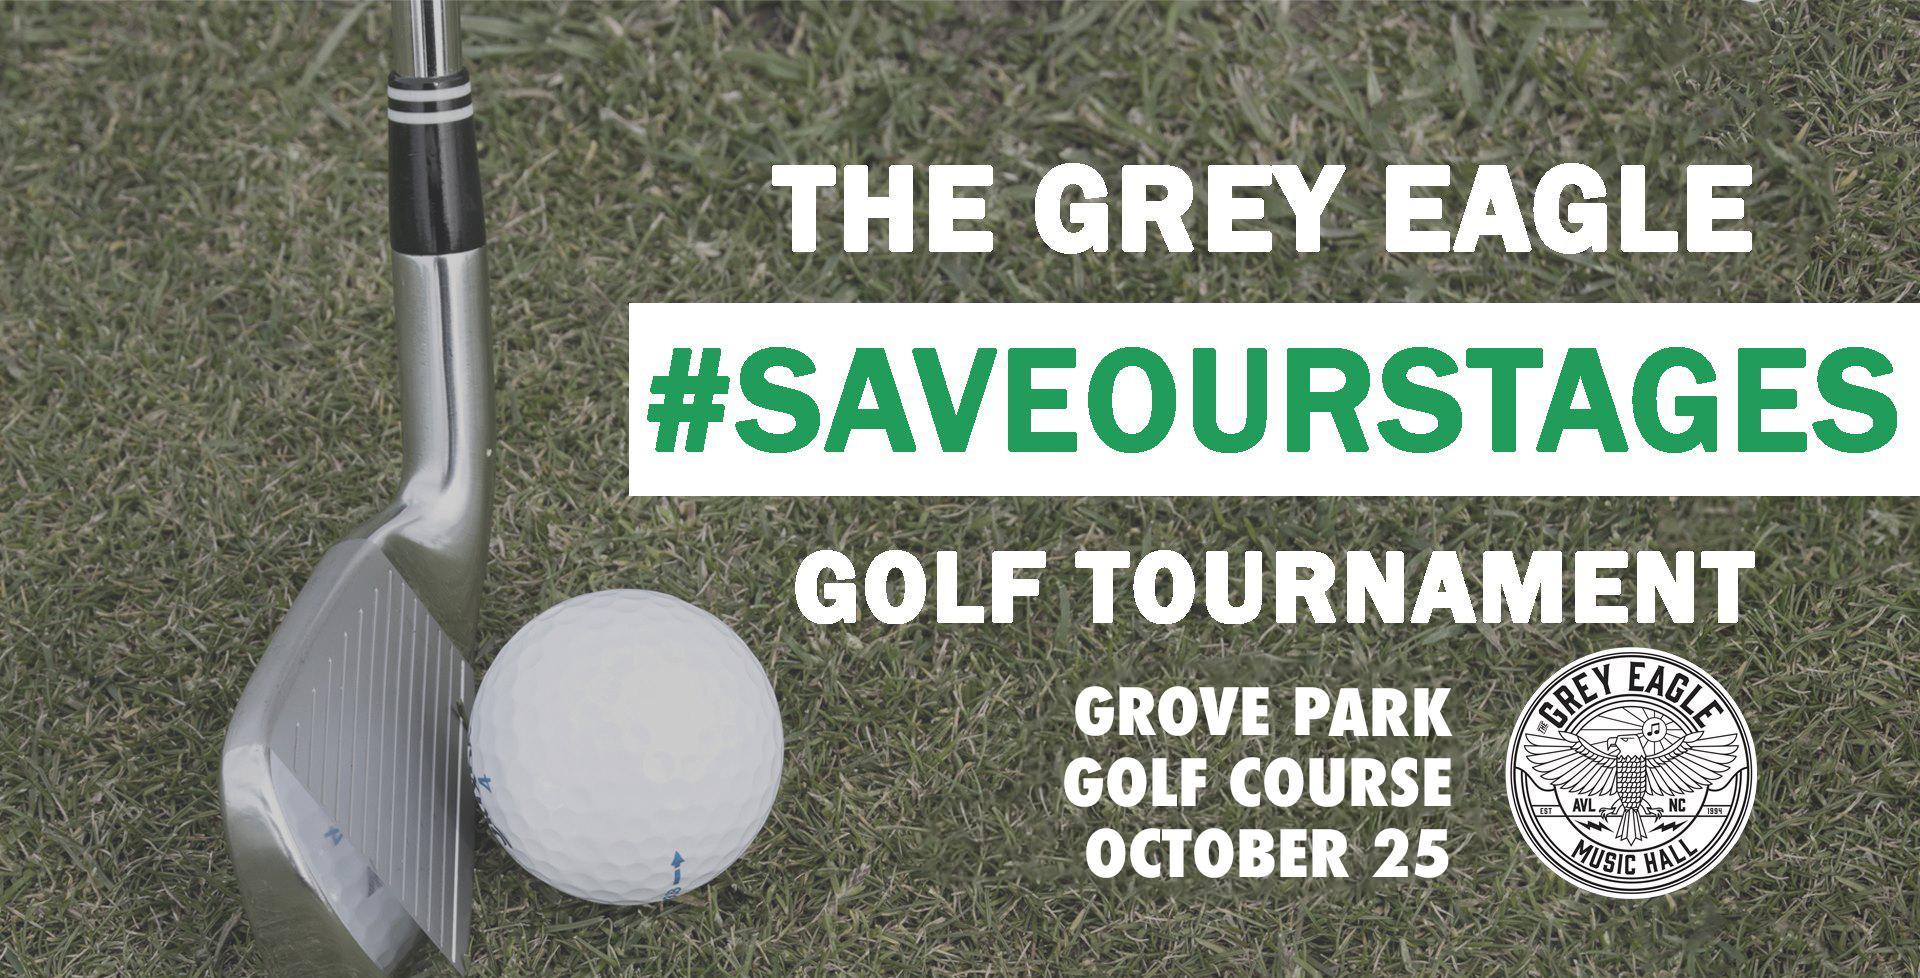 #SaveOurStages Golf Tournament